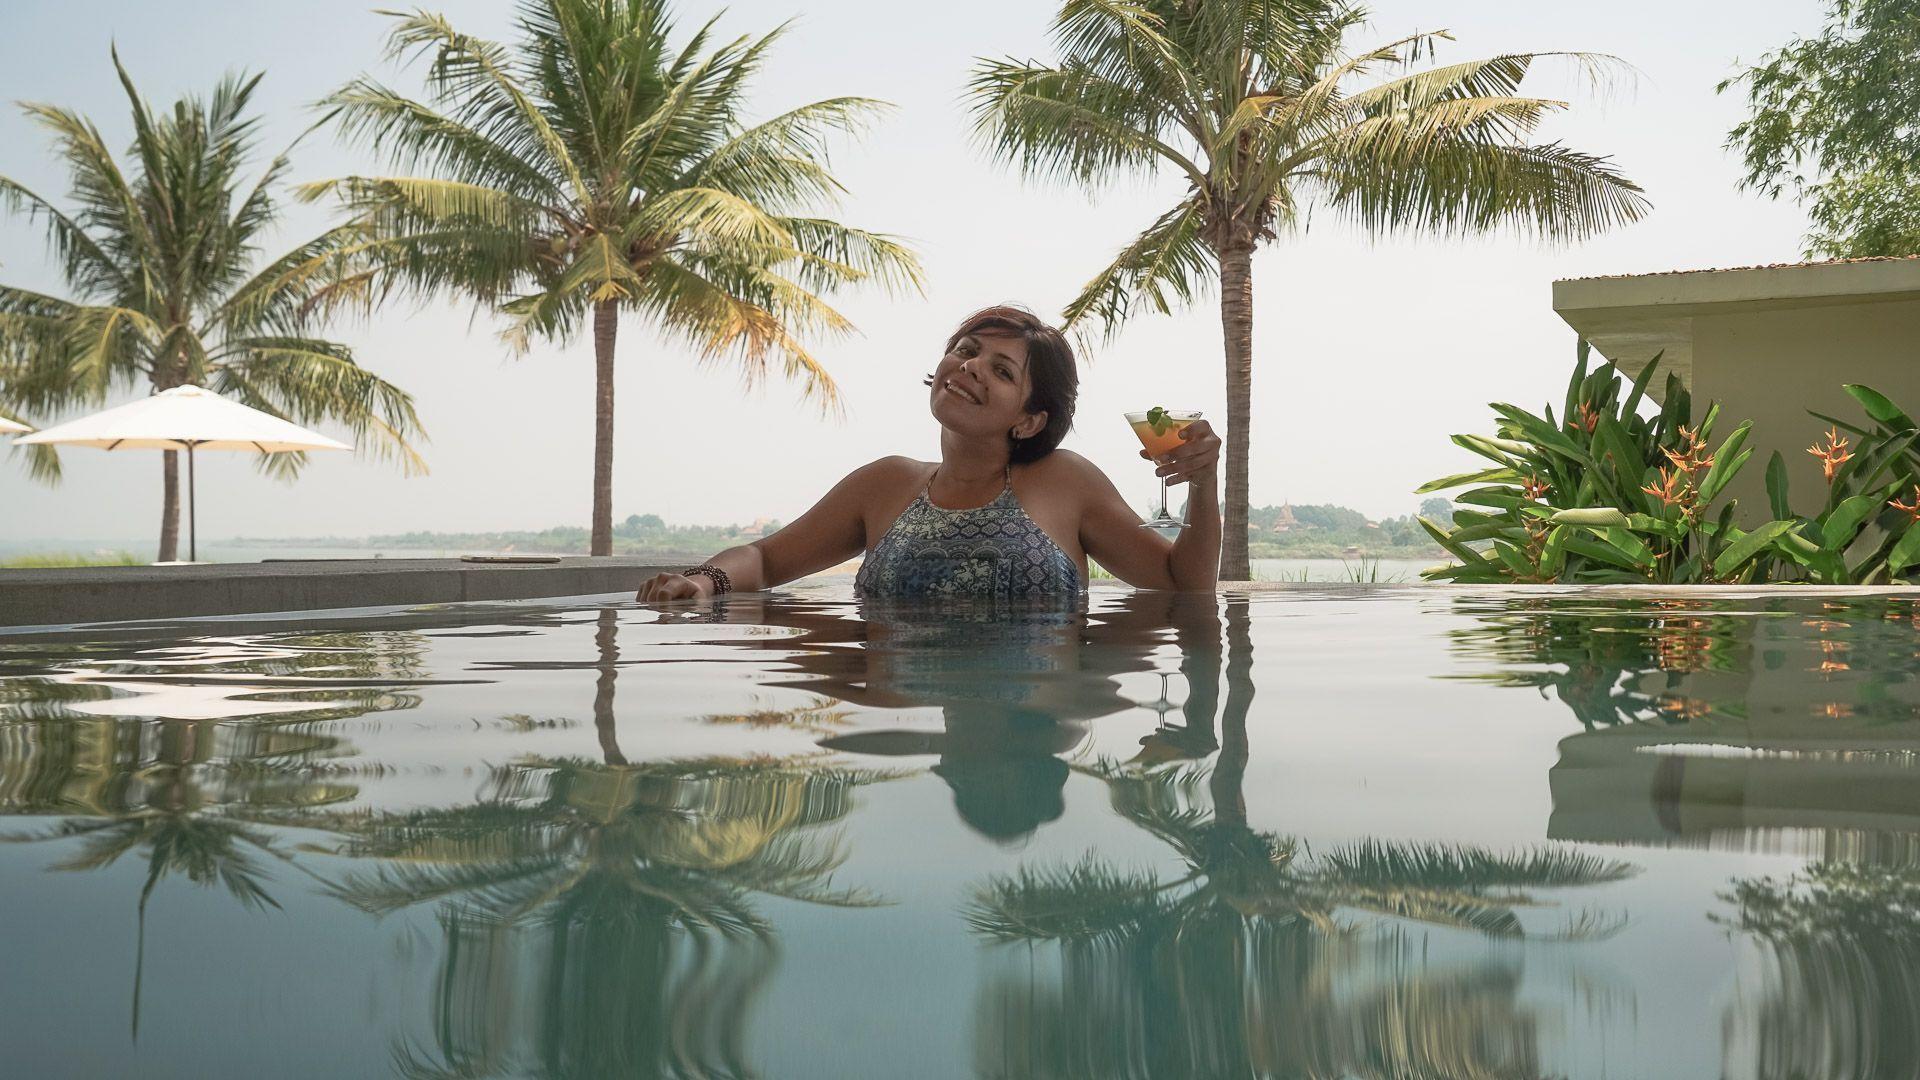 Lesvoyageuses-voyage-Phnom-Penh-cambodge-hotel-the-bale-experience-36